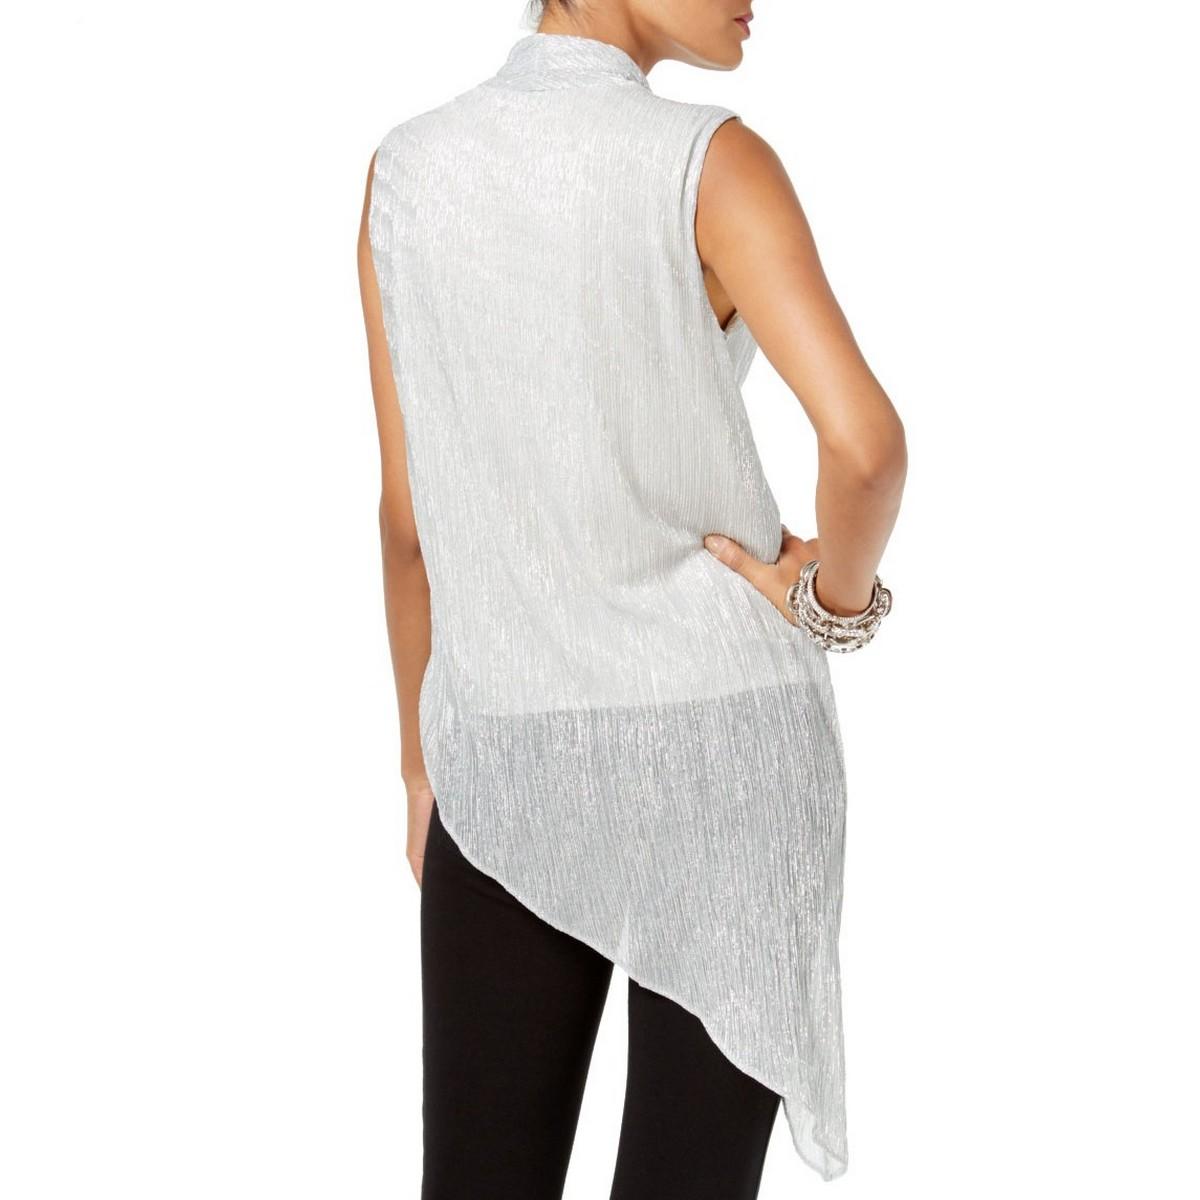 ALFANI-NEW-Women-039-s-Asymmetrical-hem-Faux-wrap-Tunic-Shirt-Top-TEDO thumbnail 6